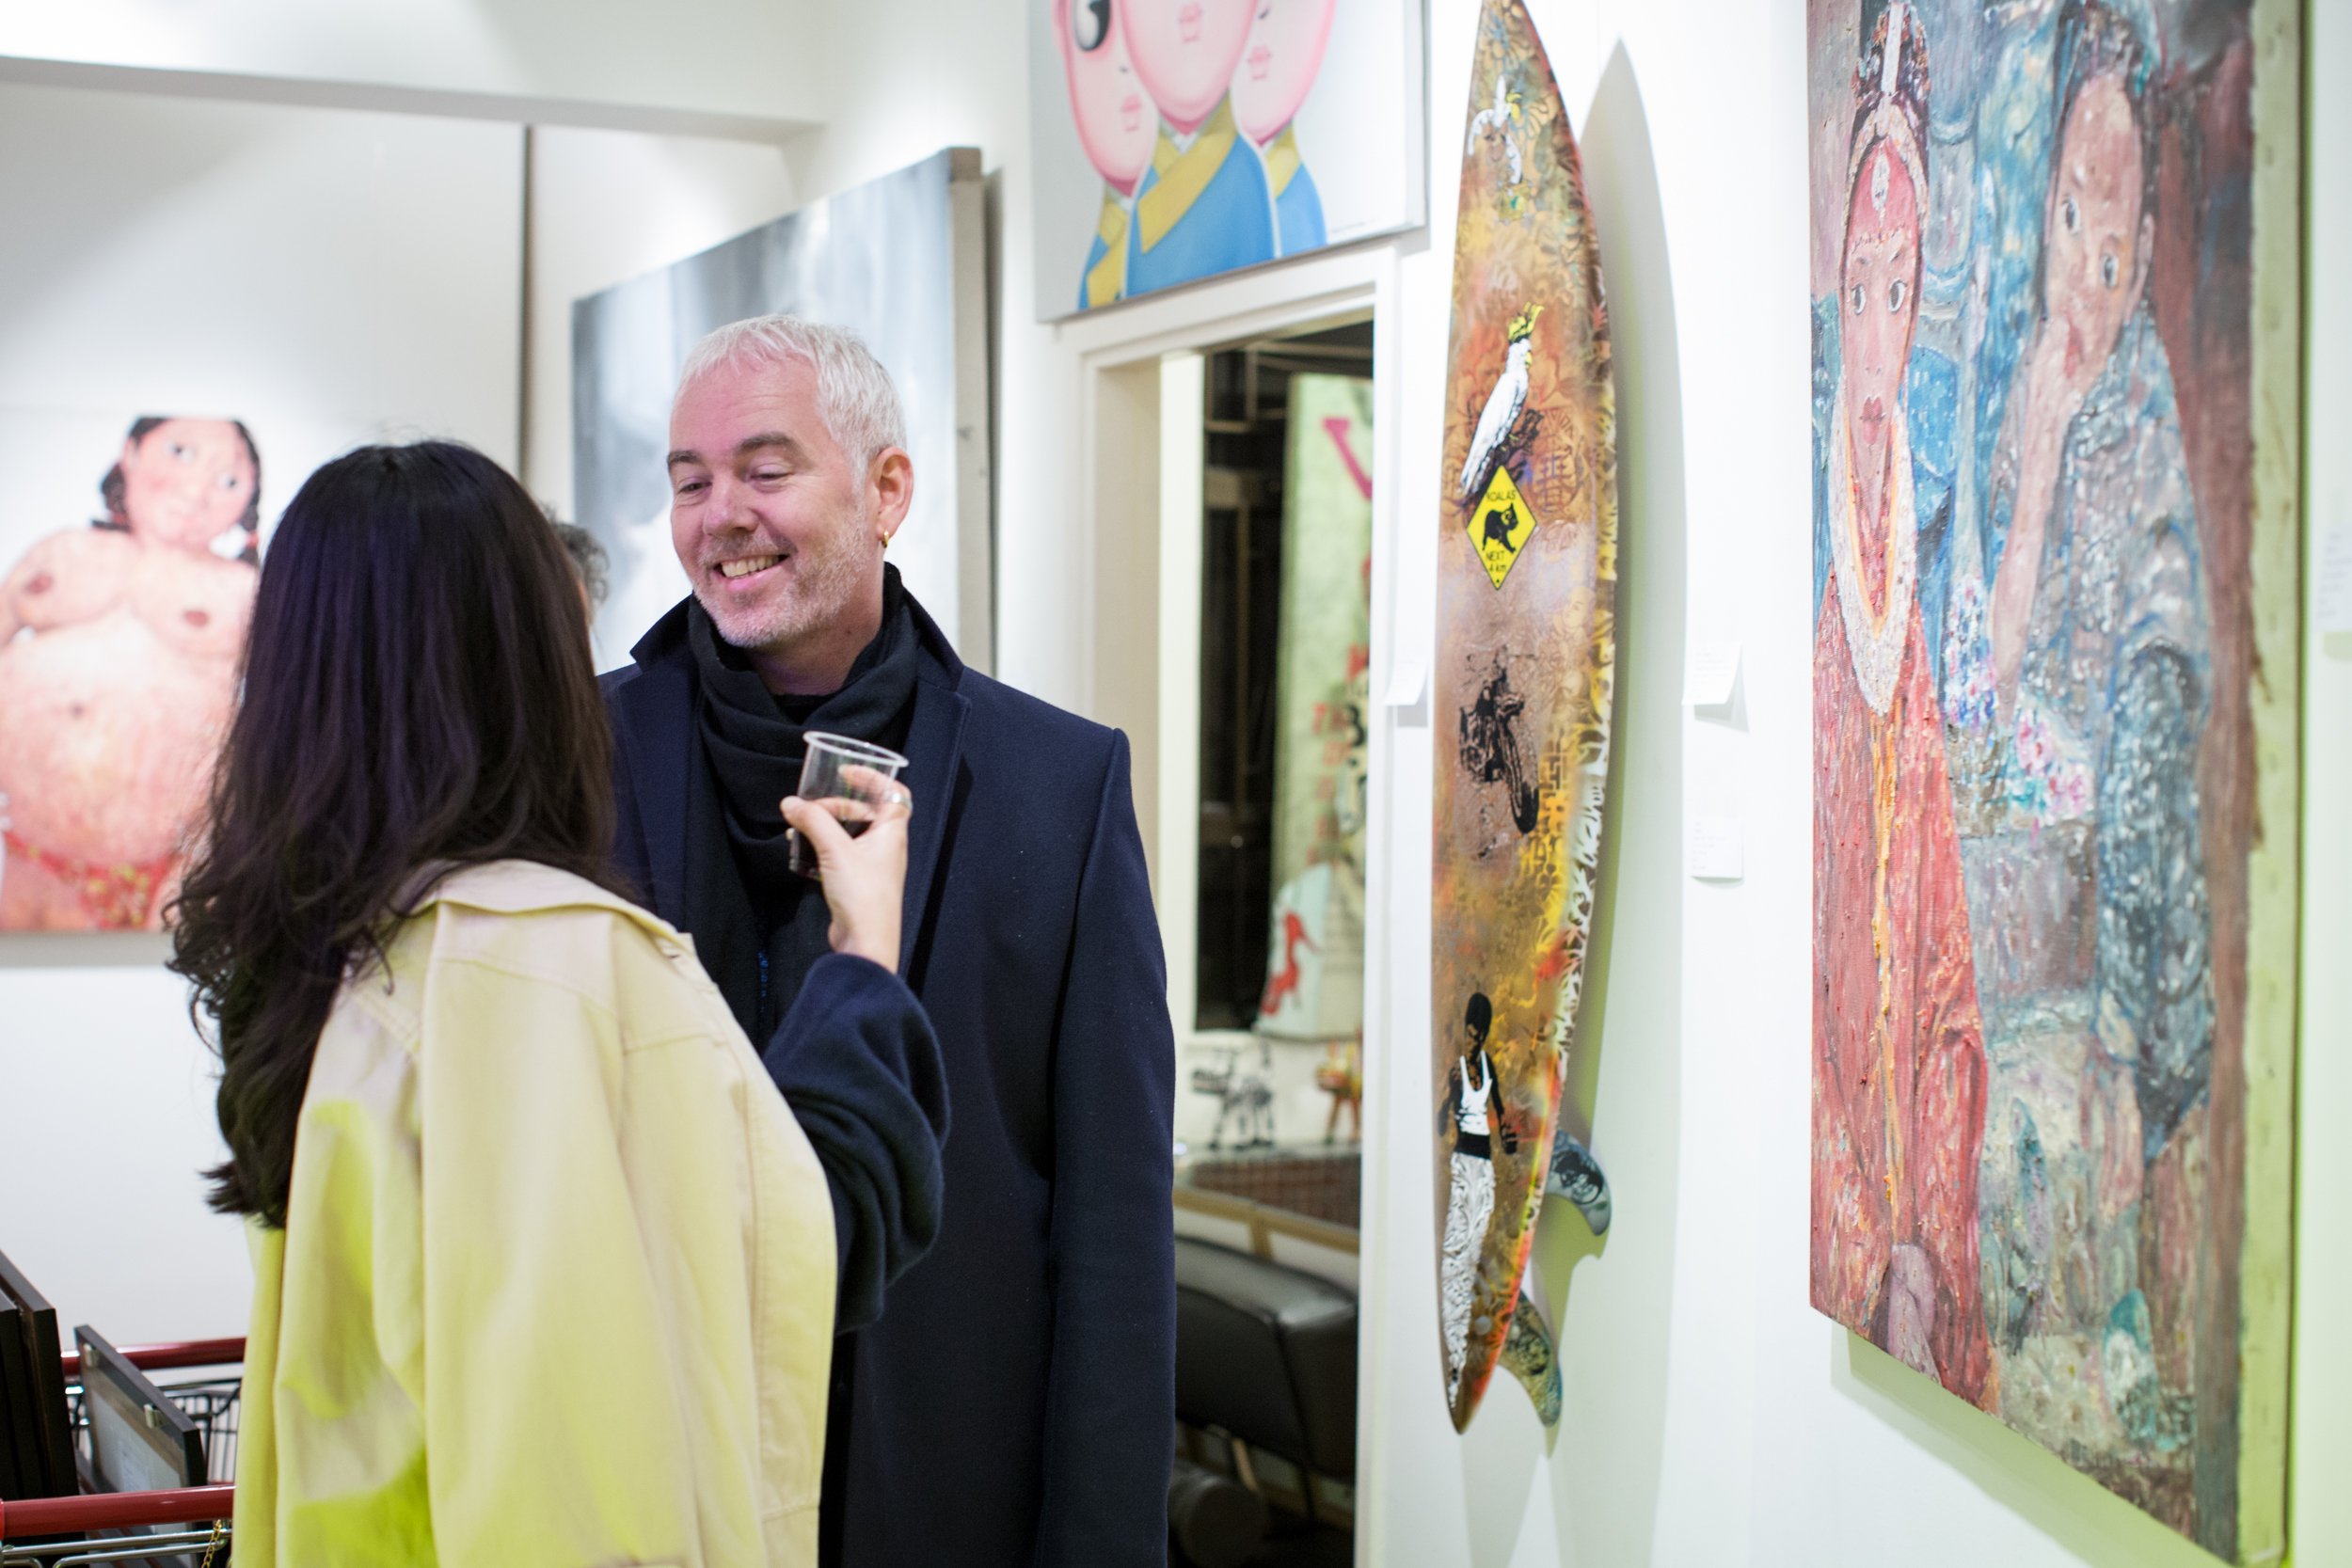 ArtSupermarket+Event+Feb2014-2-3085024512-O.jpg